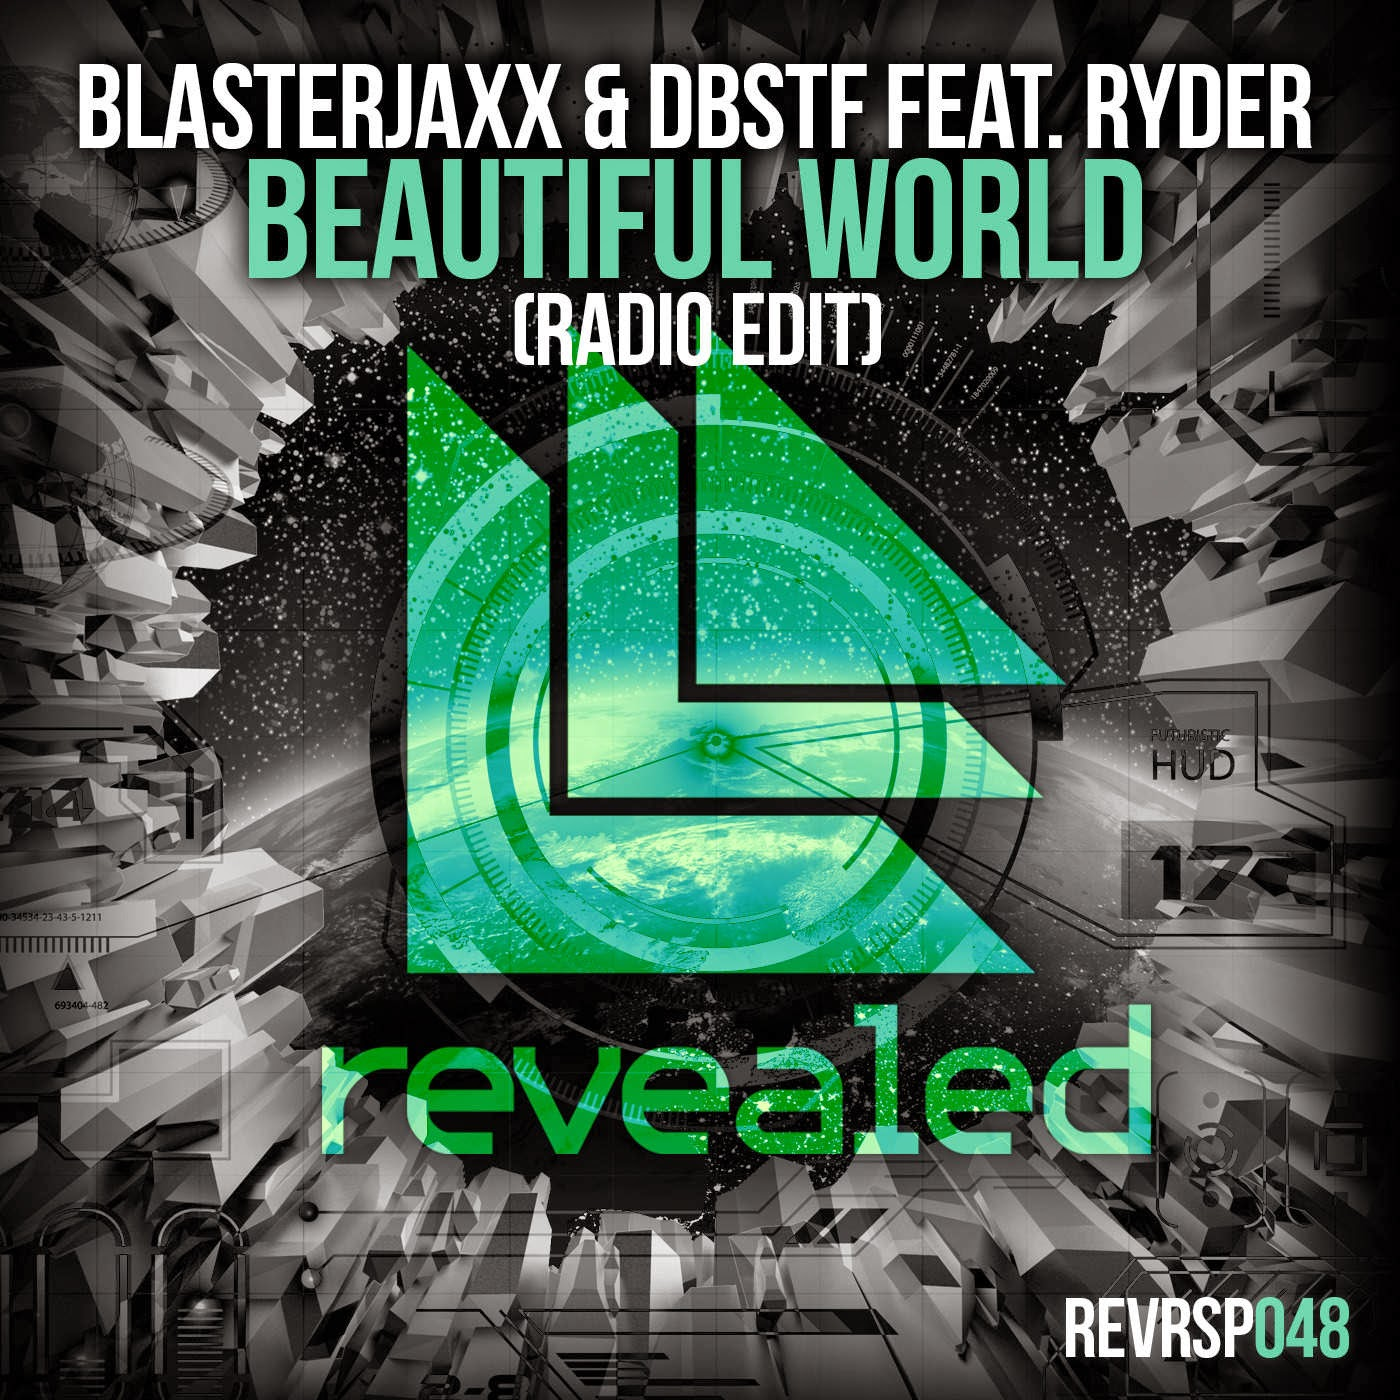 BlasterJaxx & DBSTF - Beautiful World (feat. Ryder) [Radio Edit] - Single Cover